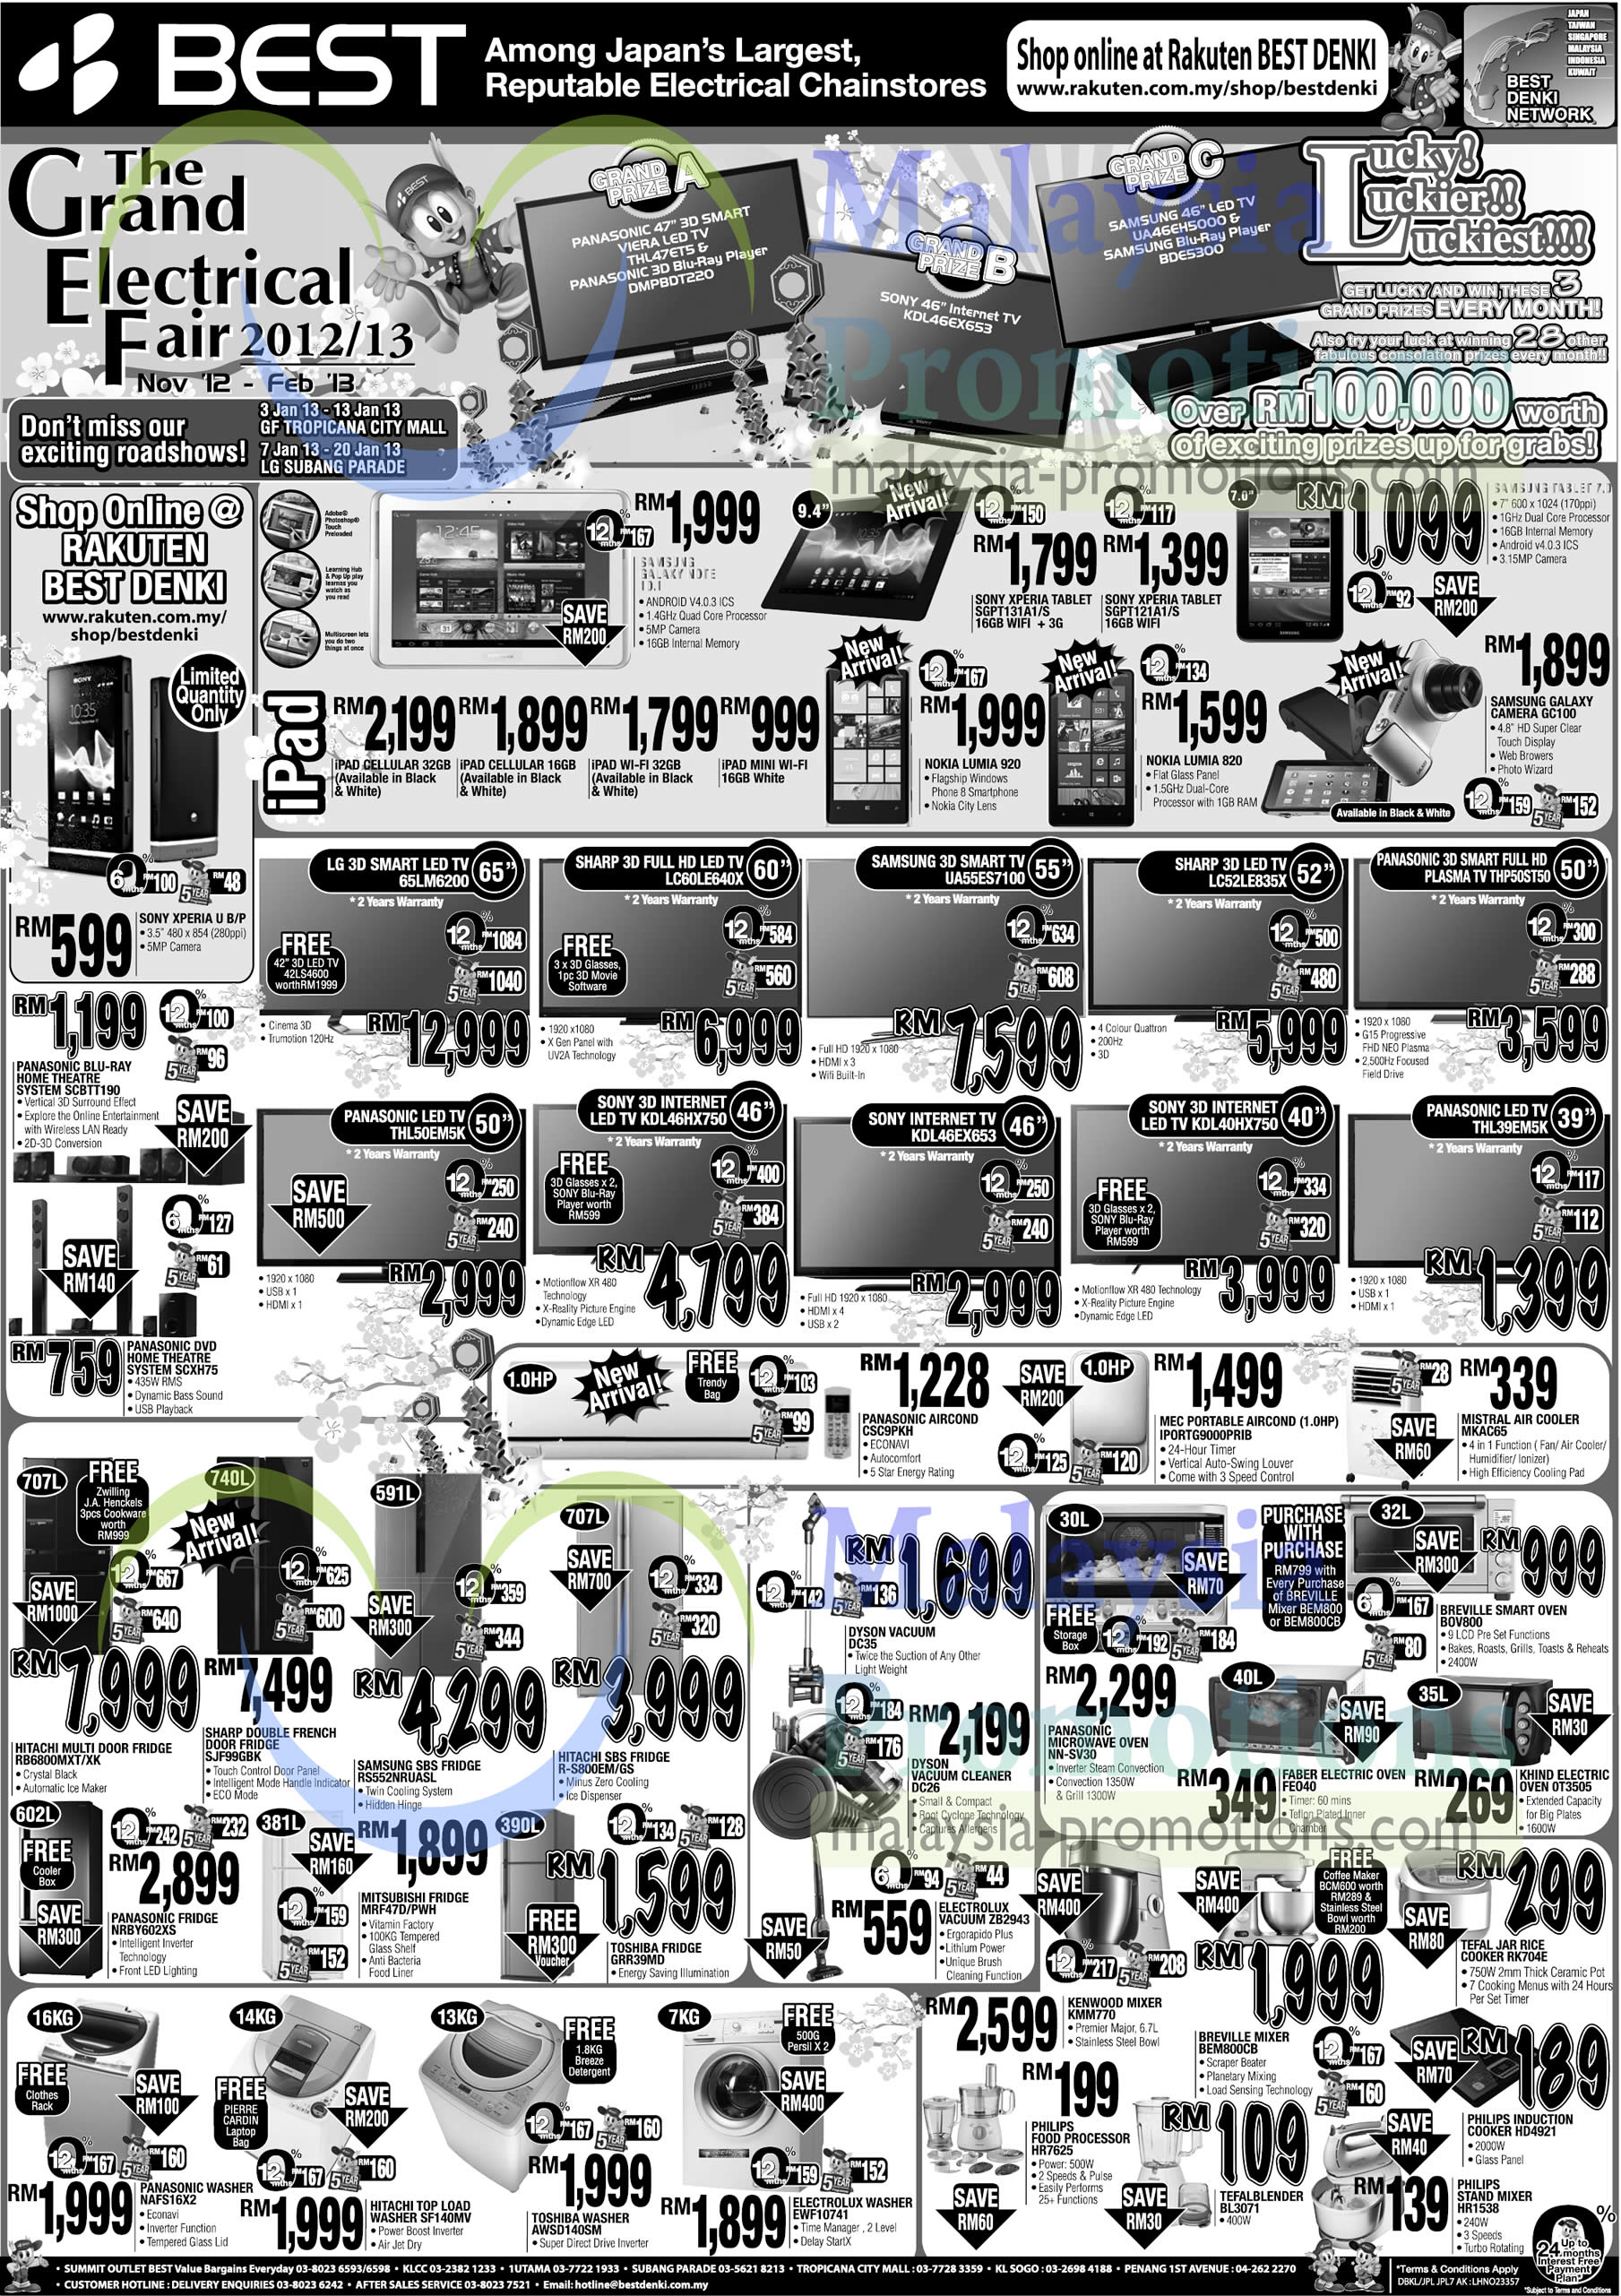 Uncategorized Sony Kitchen Appliances led tvs fridges washers tablets microwave ovens kitchen appliances panasonic samsung lg sharp sony dyson khind breville